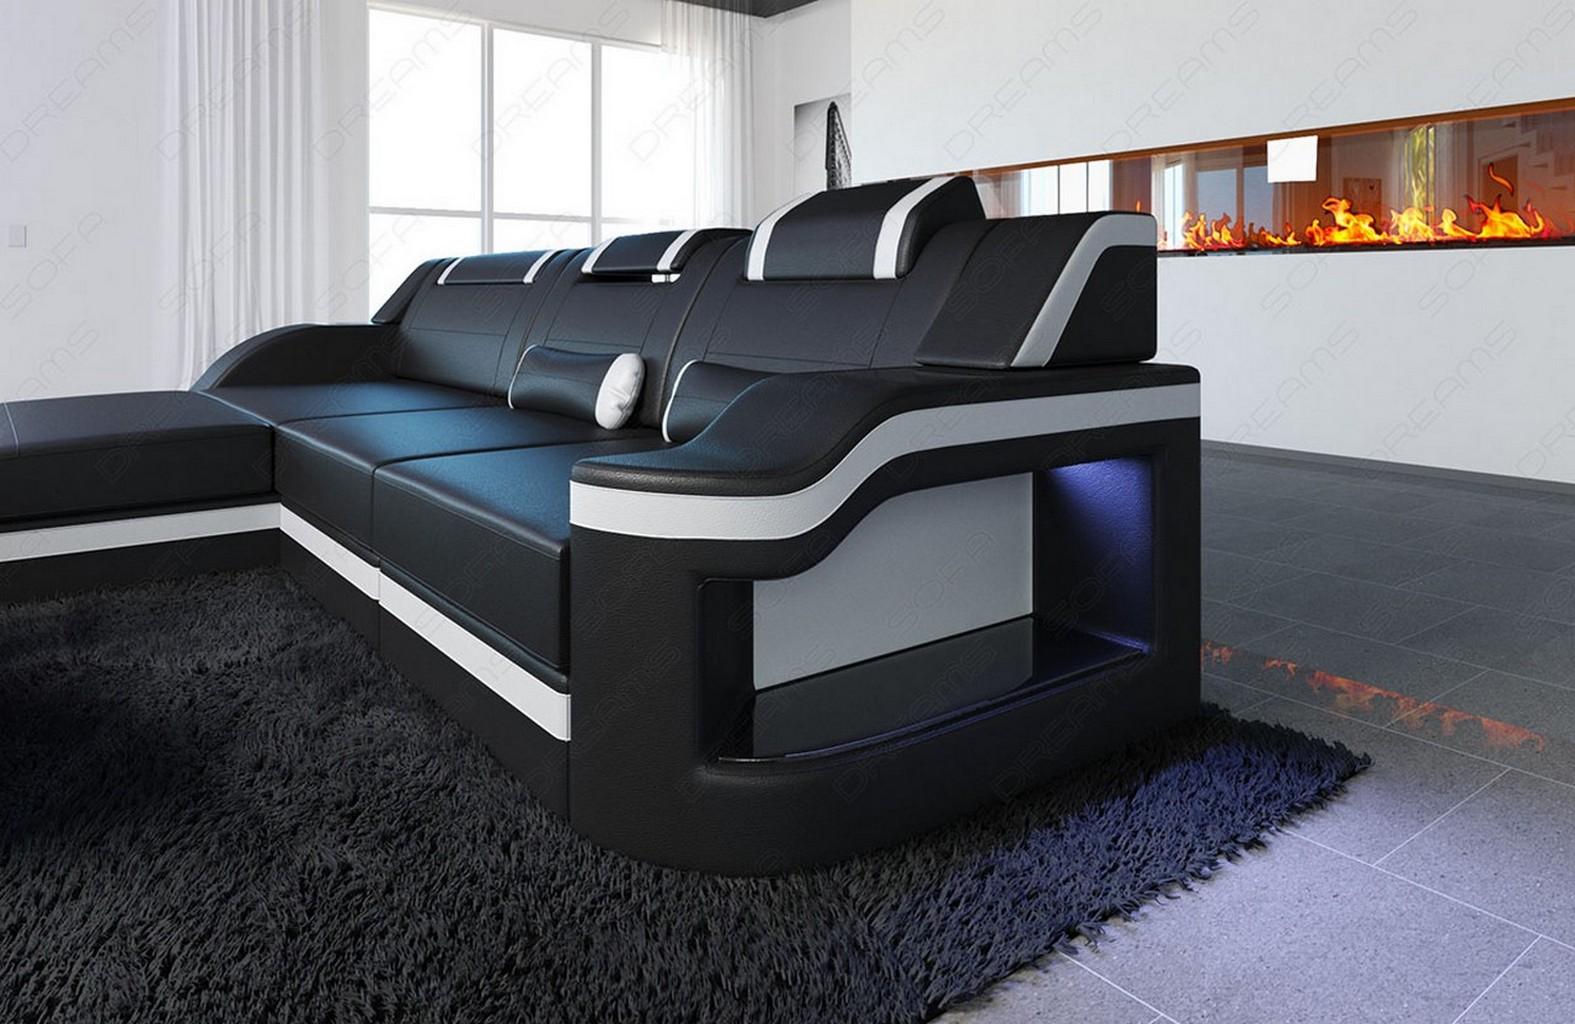 ledercouch palermo l form led designersofa eckcouch design. Black Bedroom Furniture Sets. Home Design Ideas